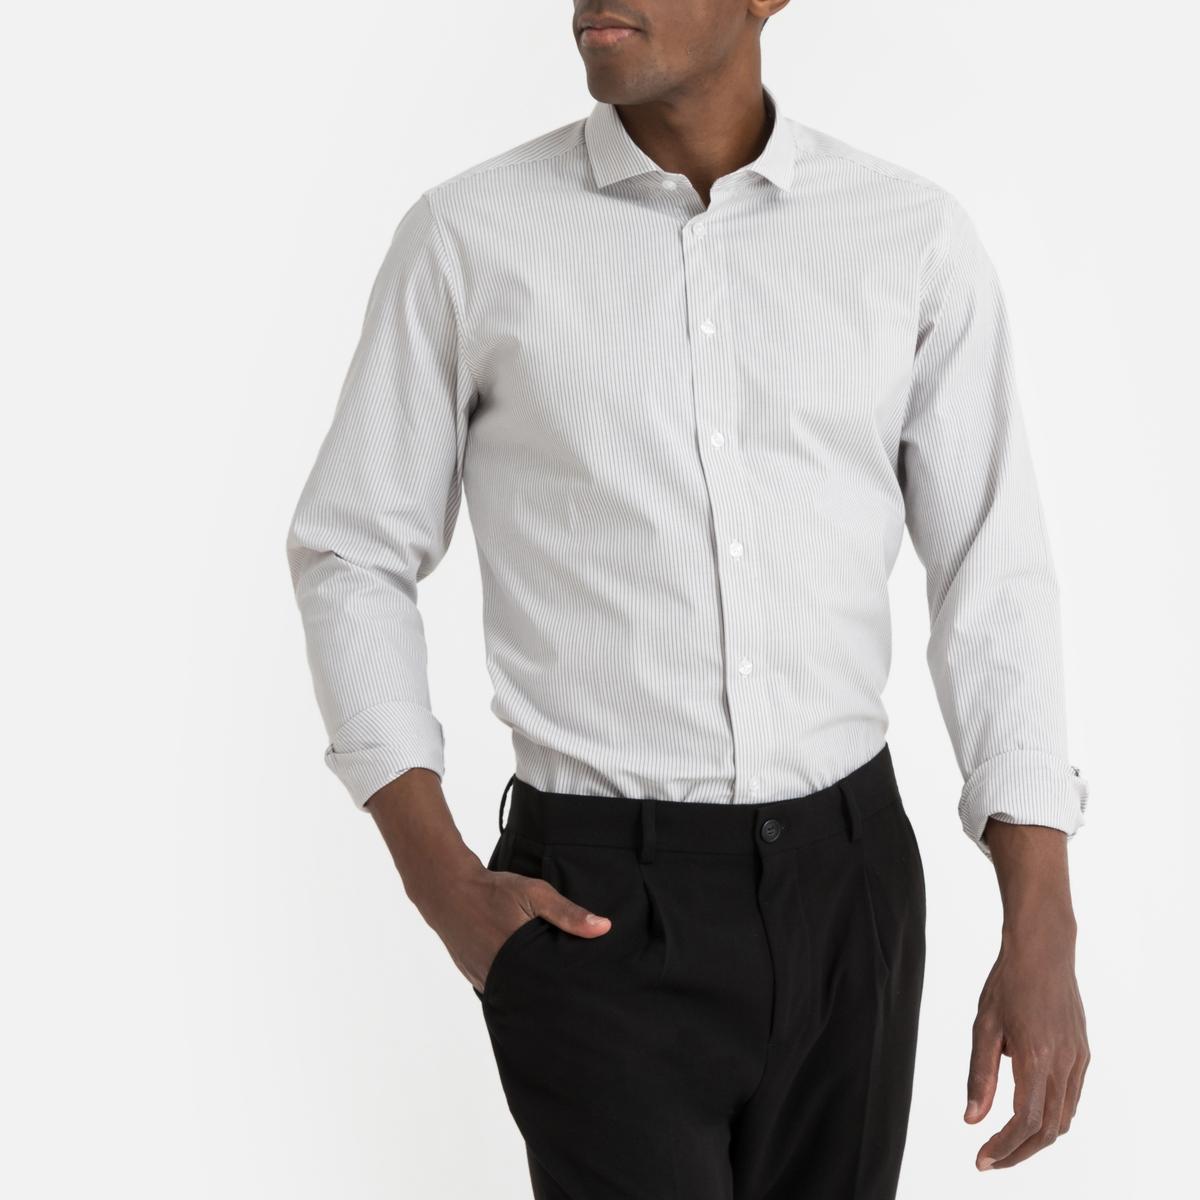 Camisa recta con rayas finas, manga larga